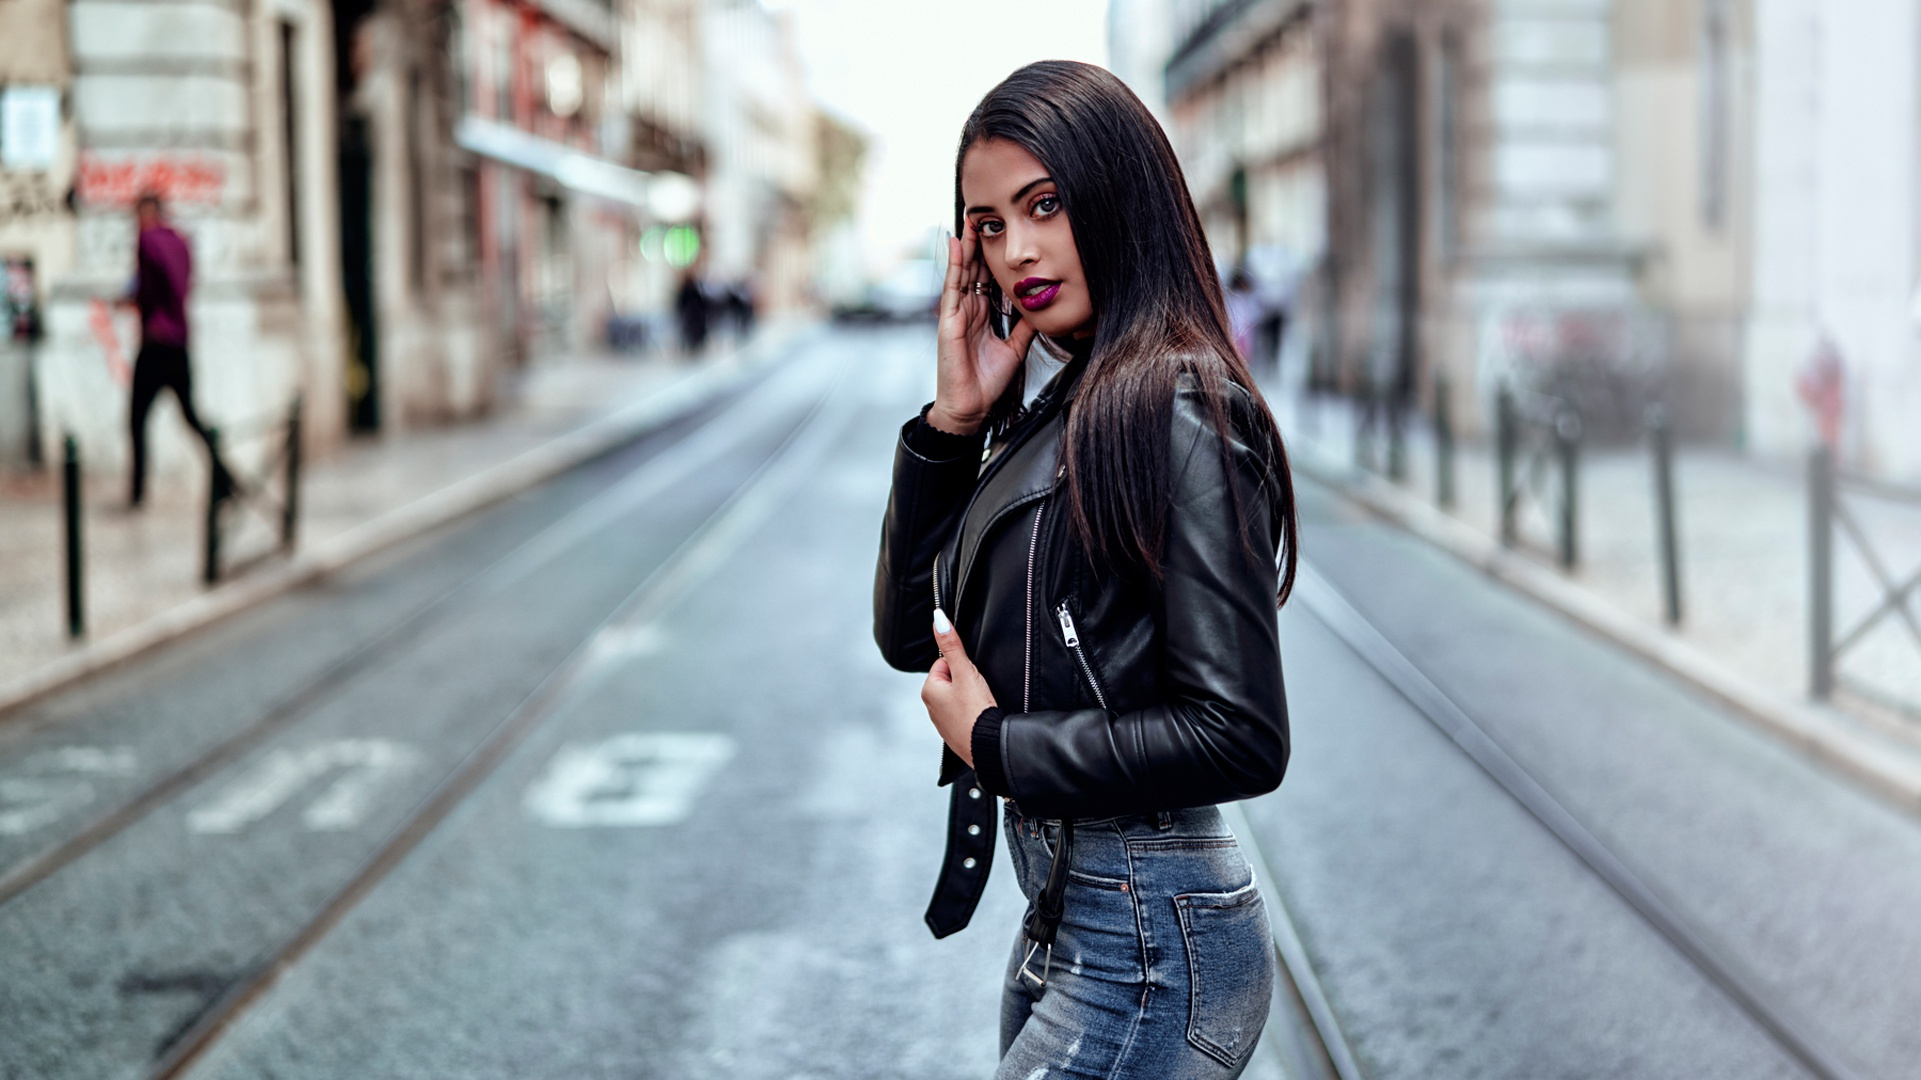 Woman Black Hair Lipstick Depth Of Field Leather Jacket 1921x1080